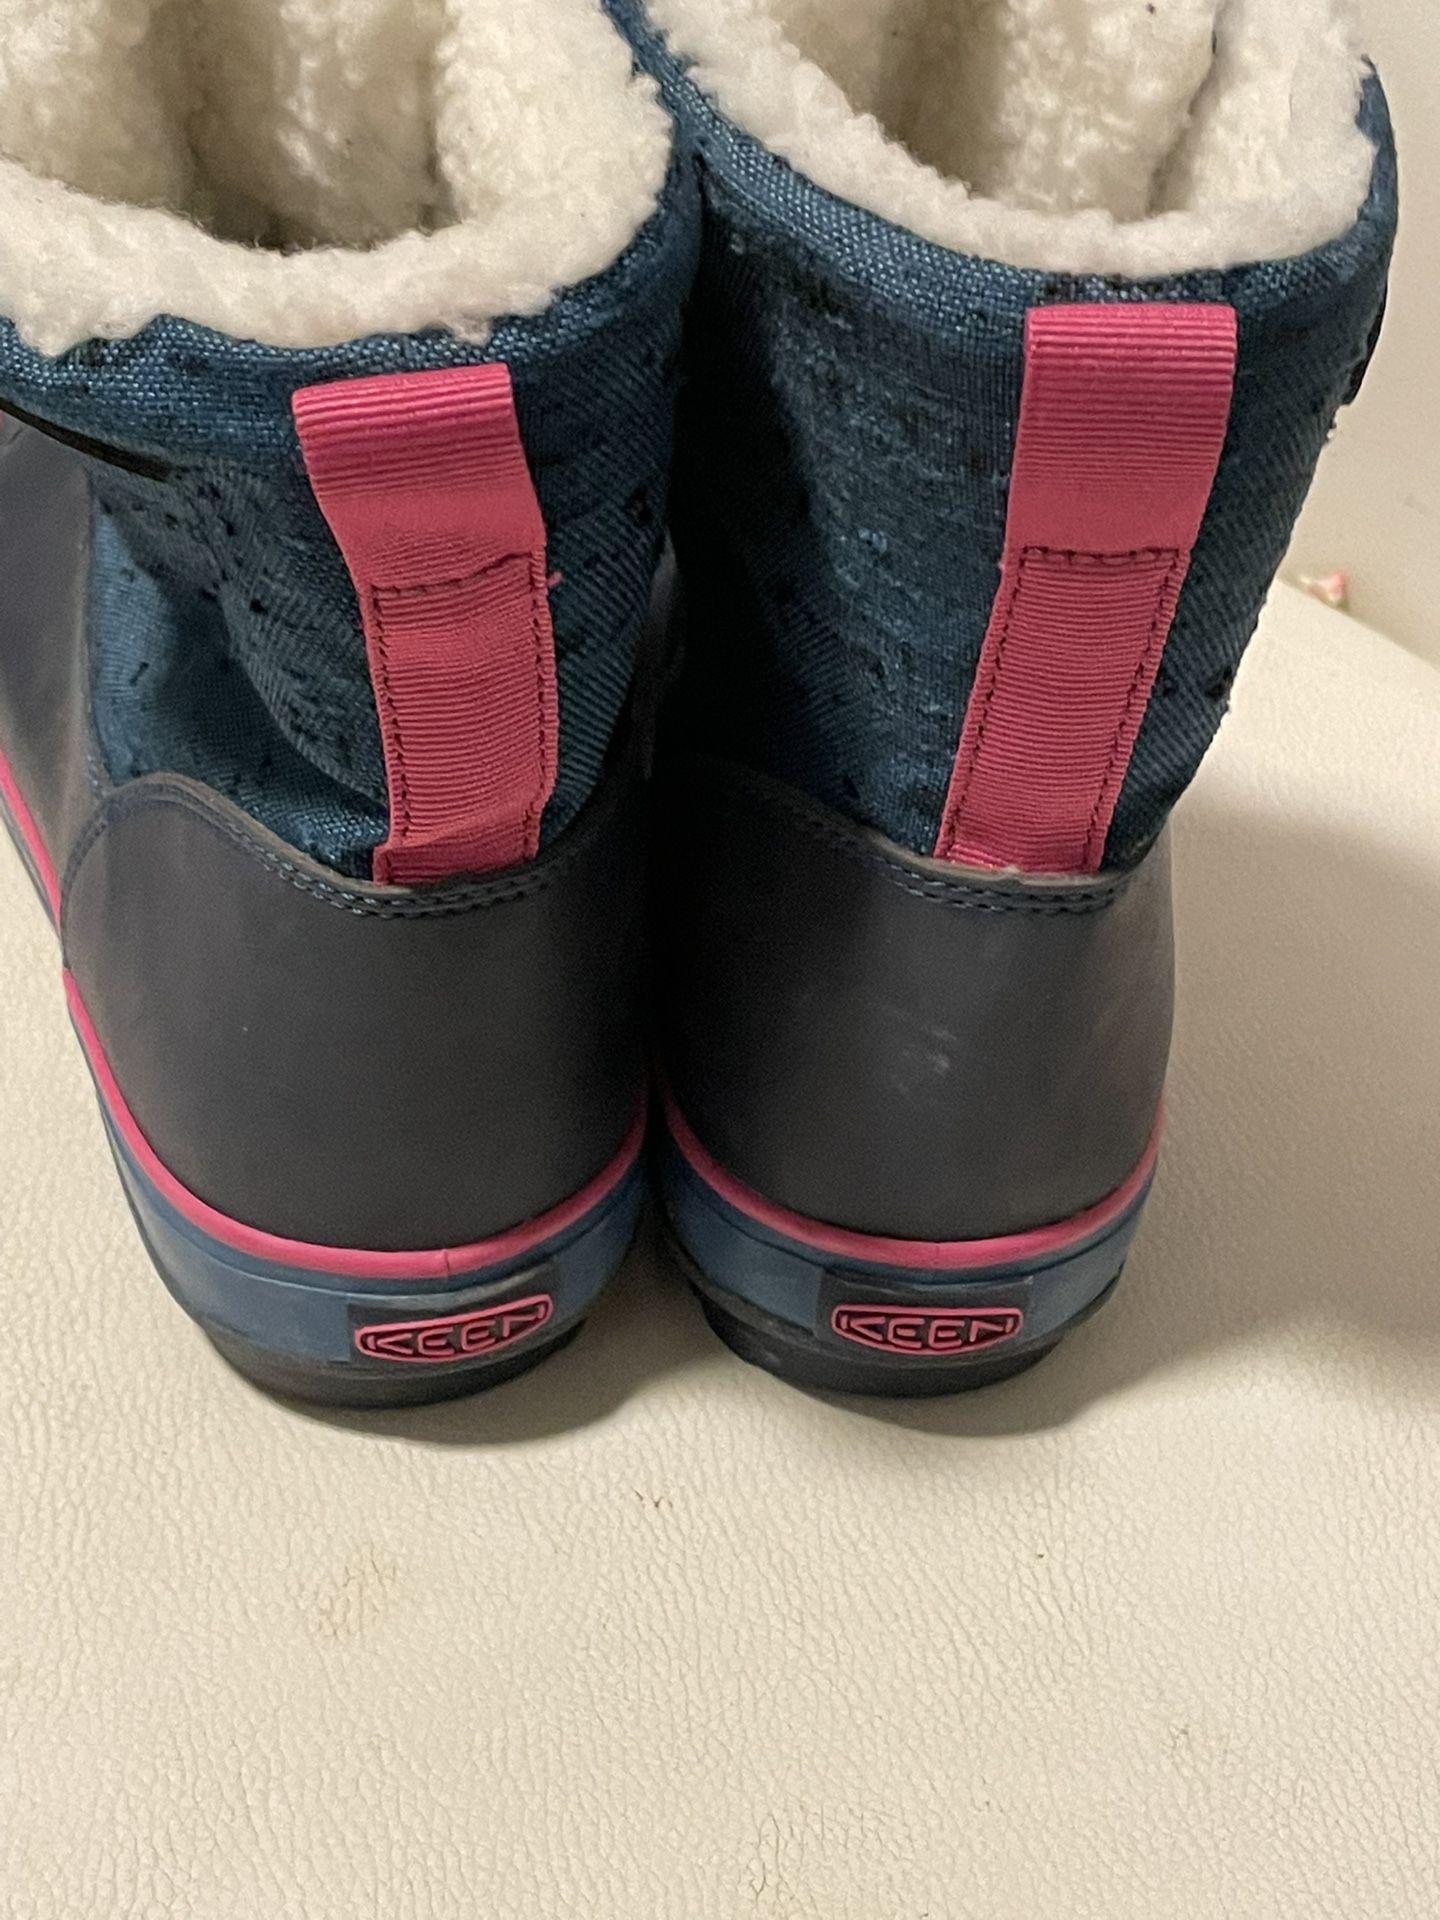 Keen Woman Winter Boots Size 37